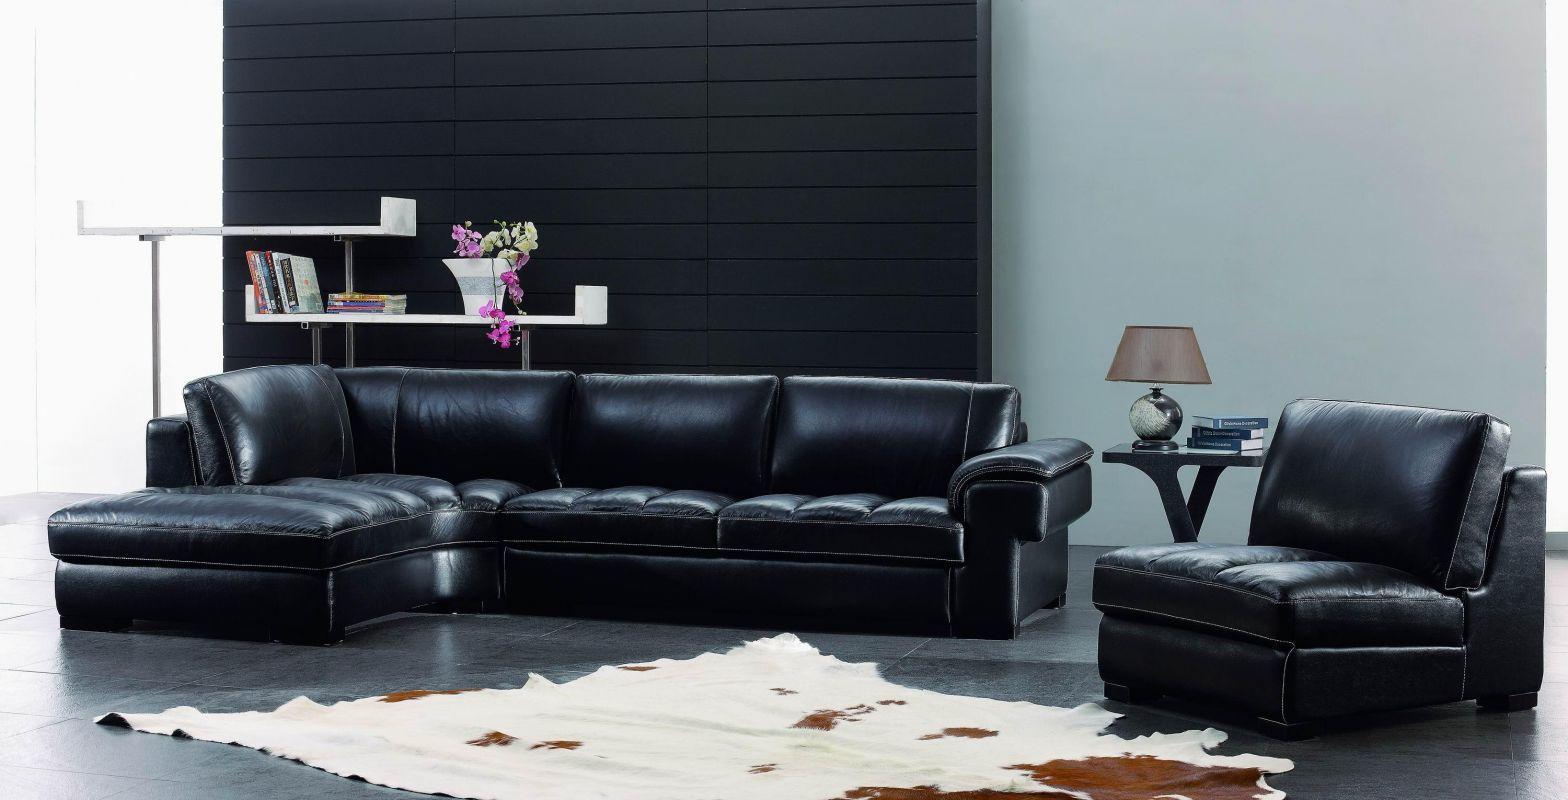 Modern living room furniture sets ideas highlifestyle